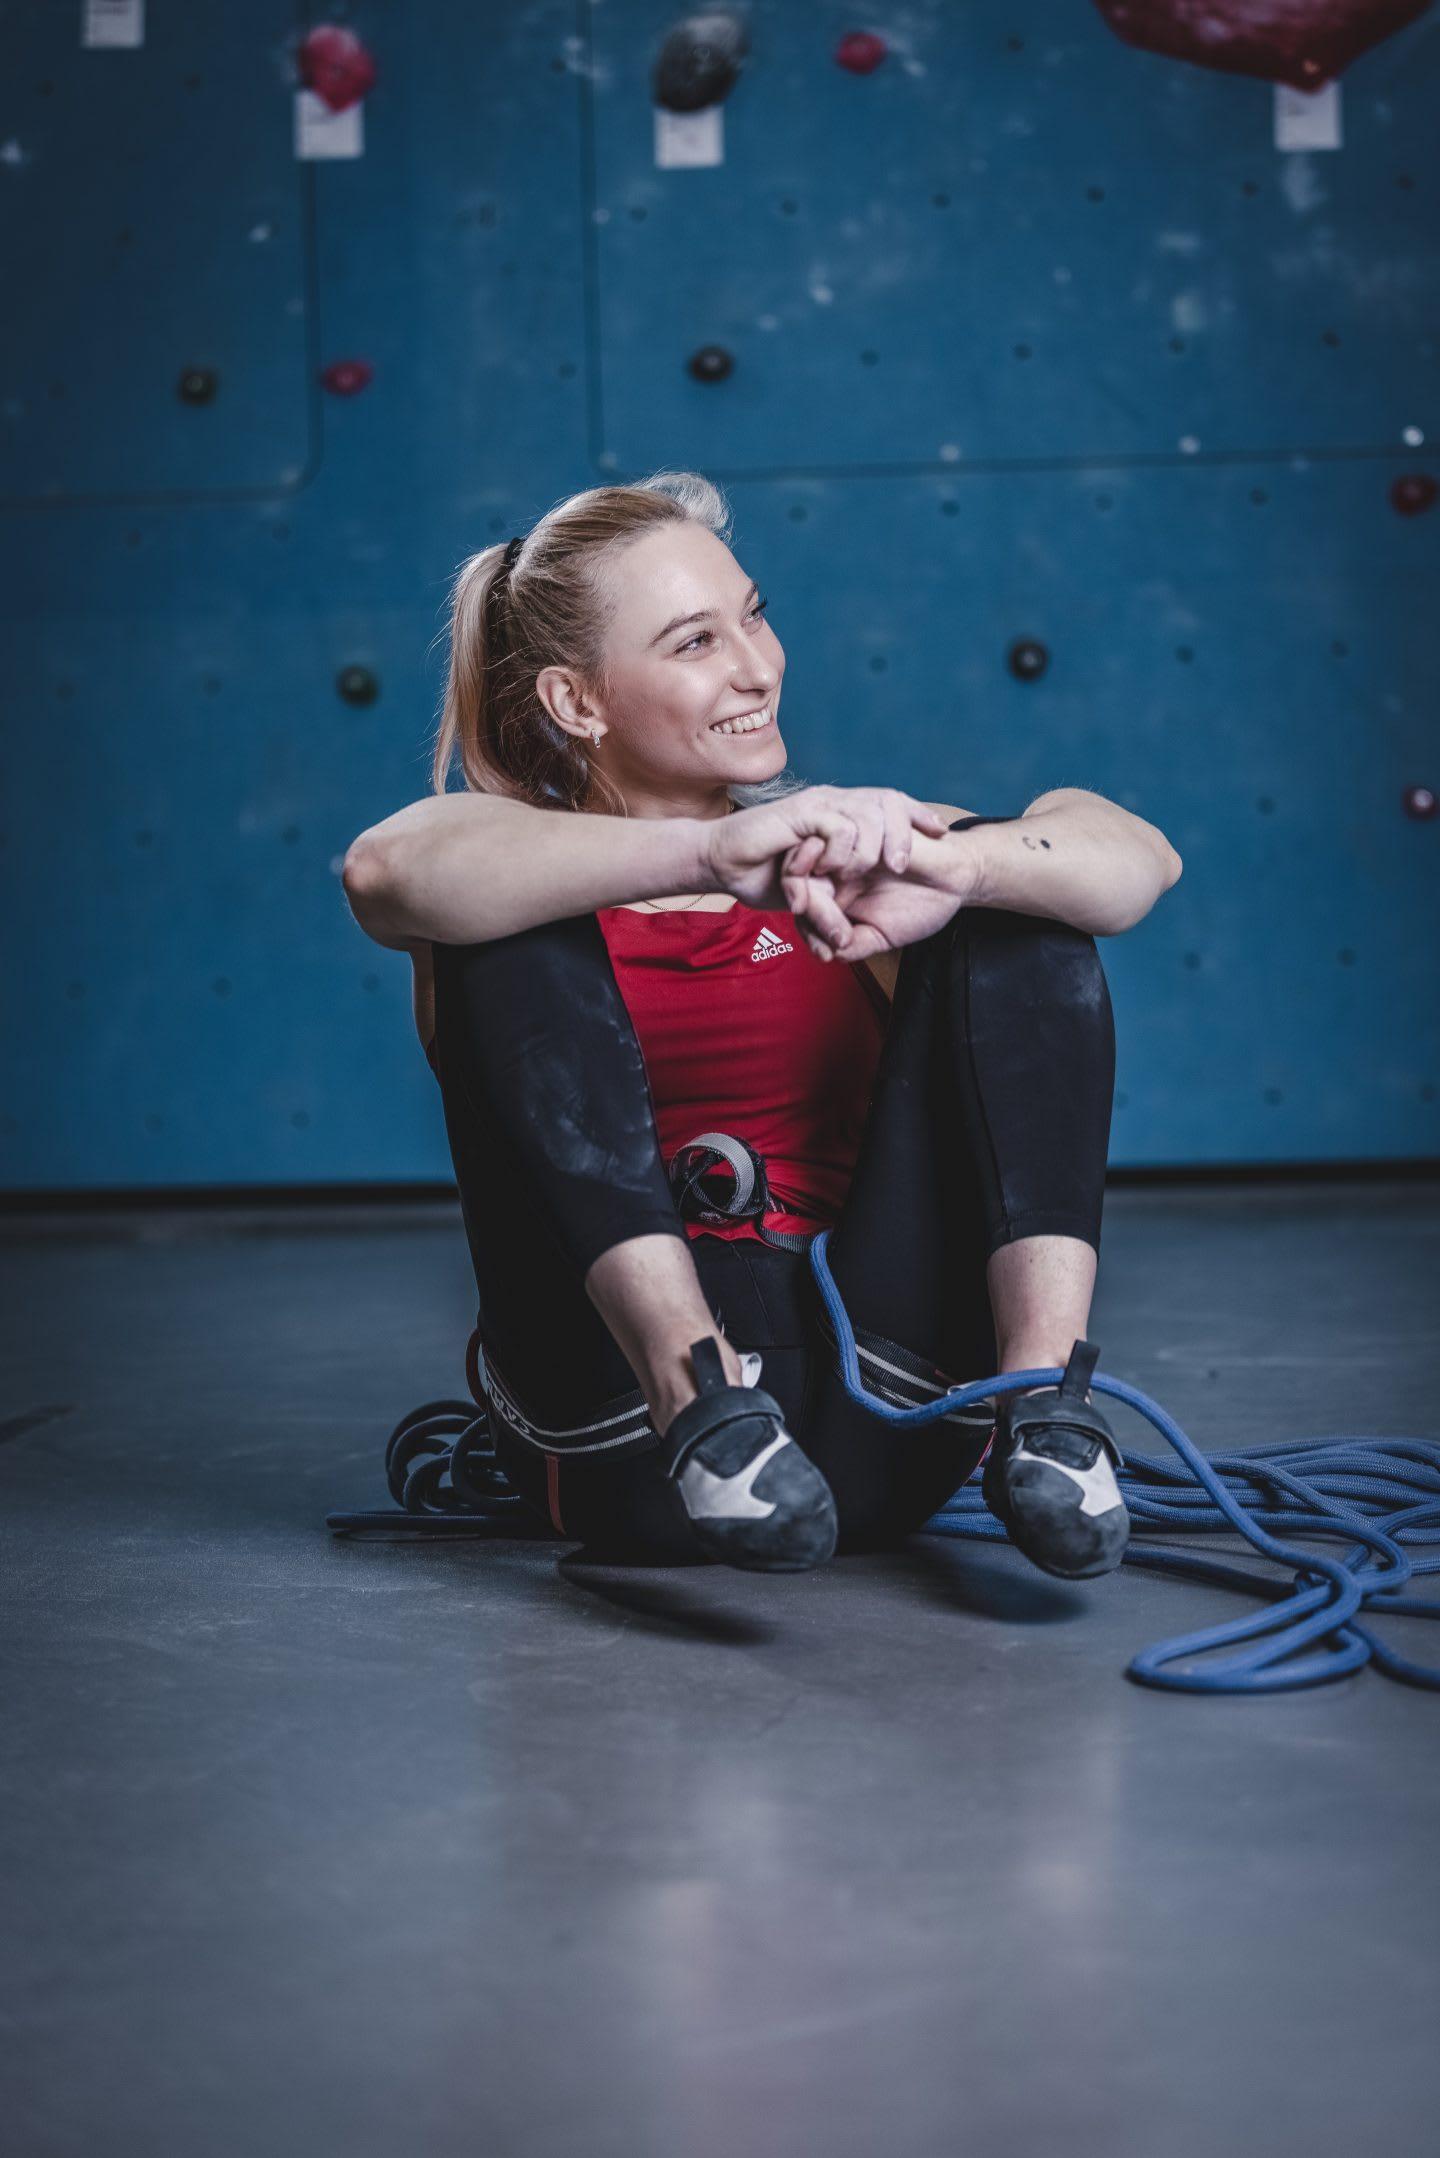 Janja Garnbret sitting and smiling after climbing session. Janja Garnbret, climbing, mindset,